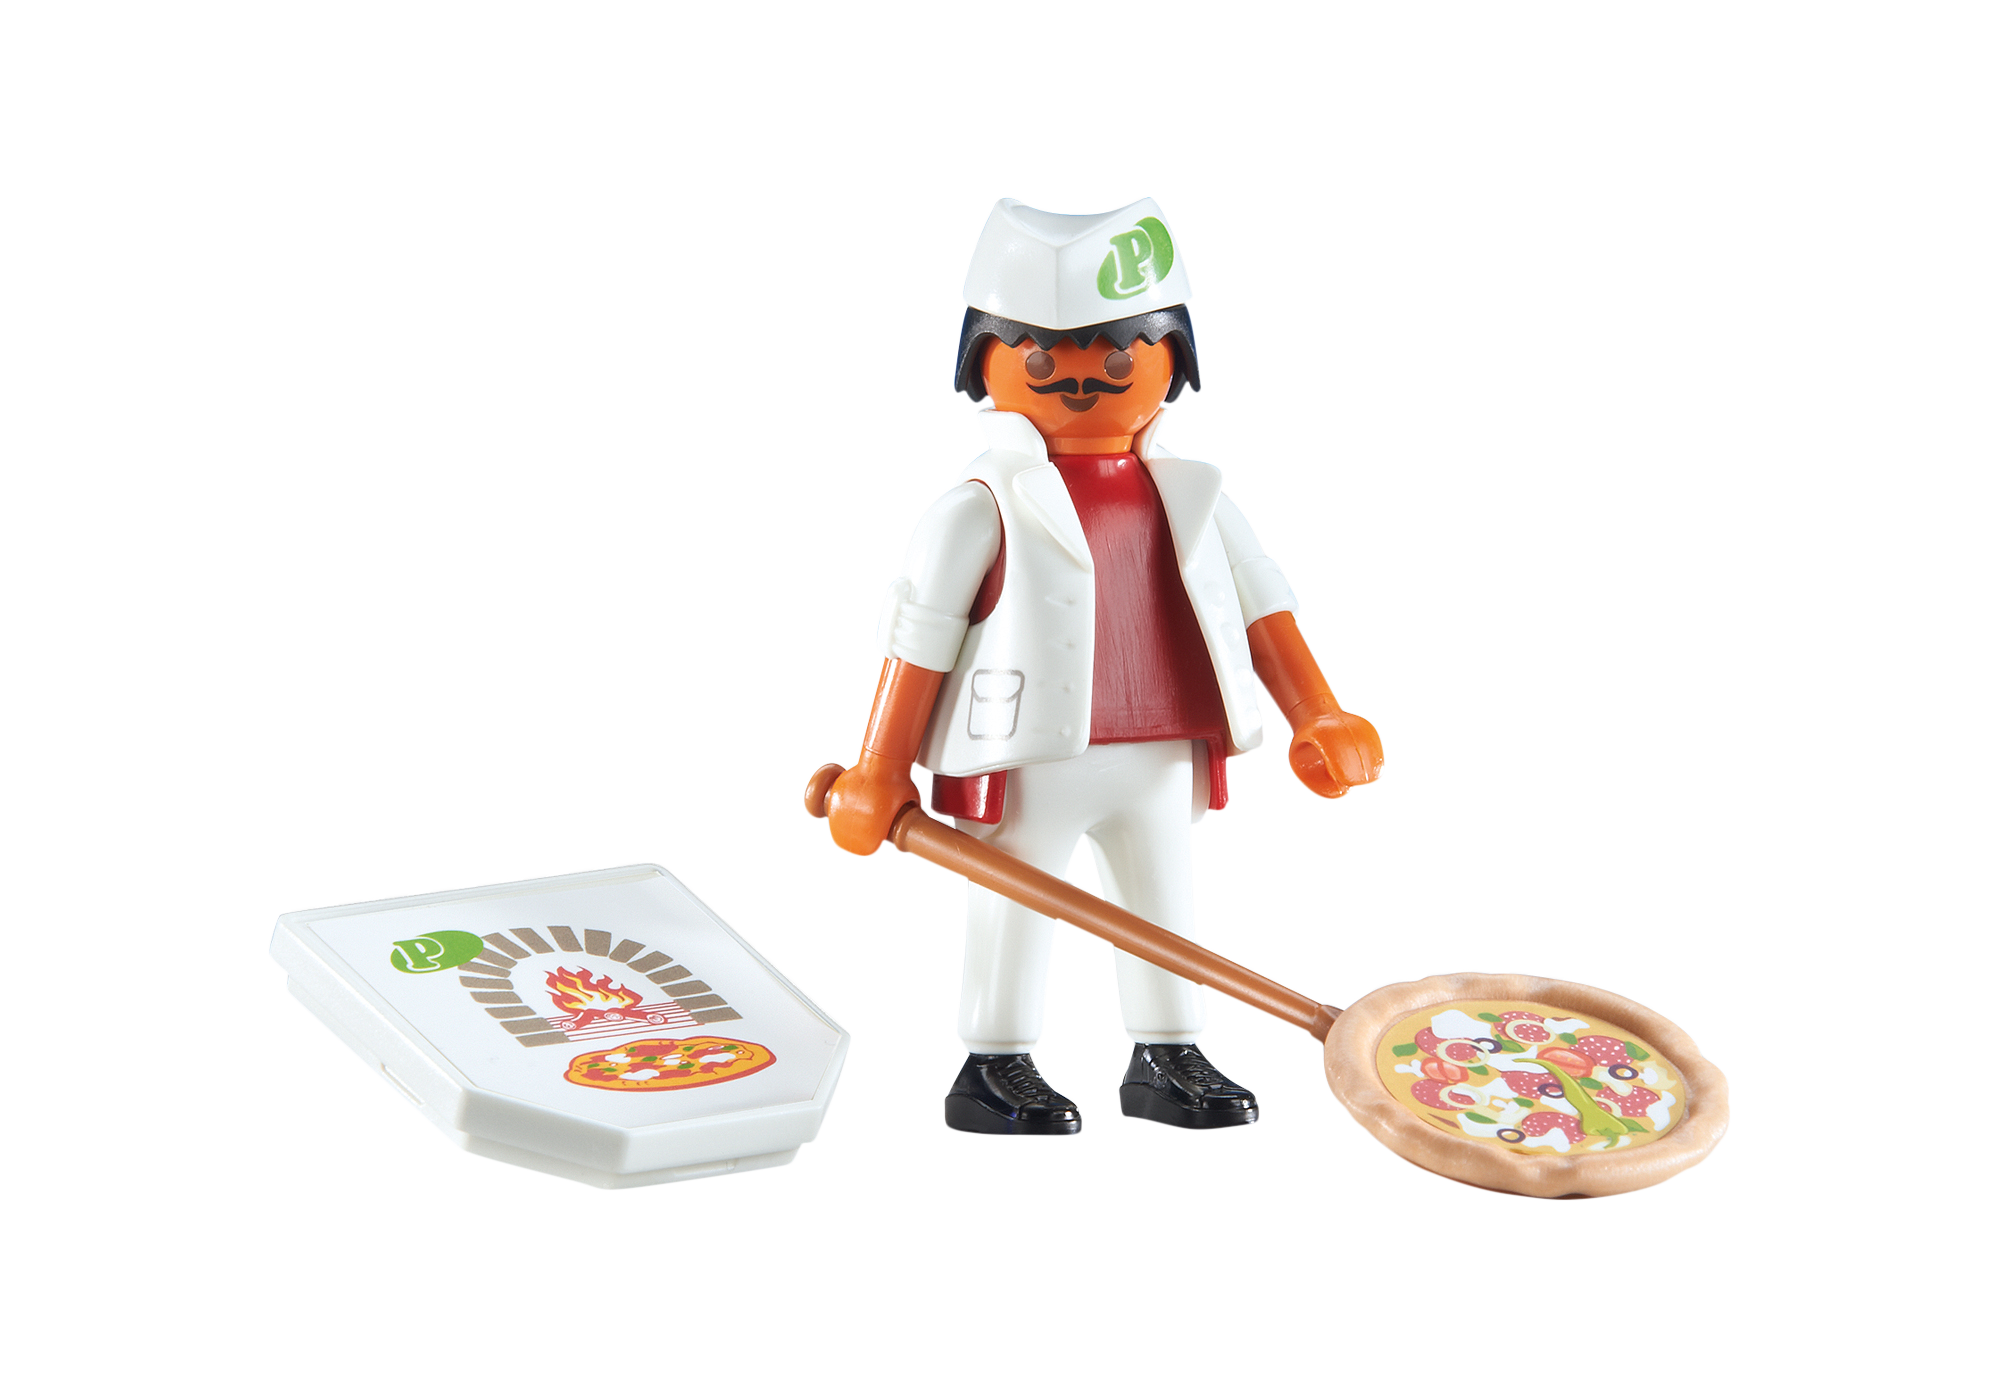 http://media.playmobil.com/i/playmobil/6392_product_detail/Pizzaiolo avec pizza